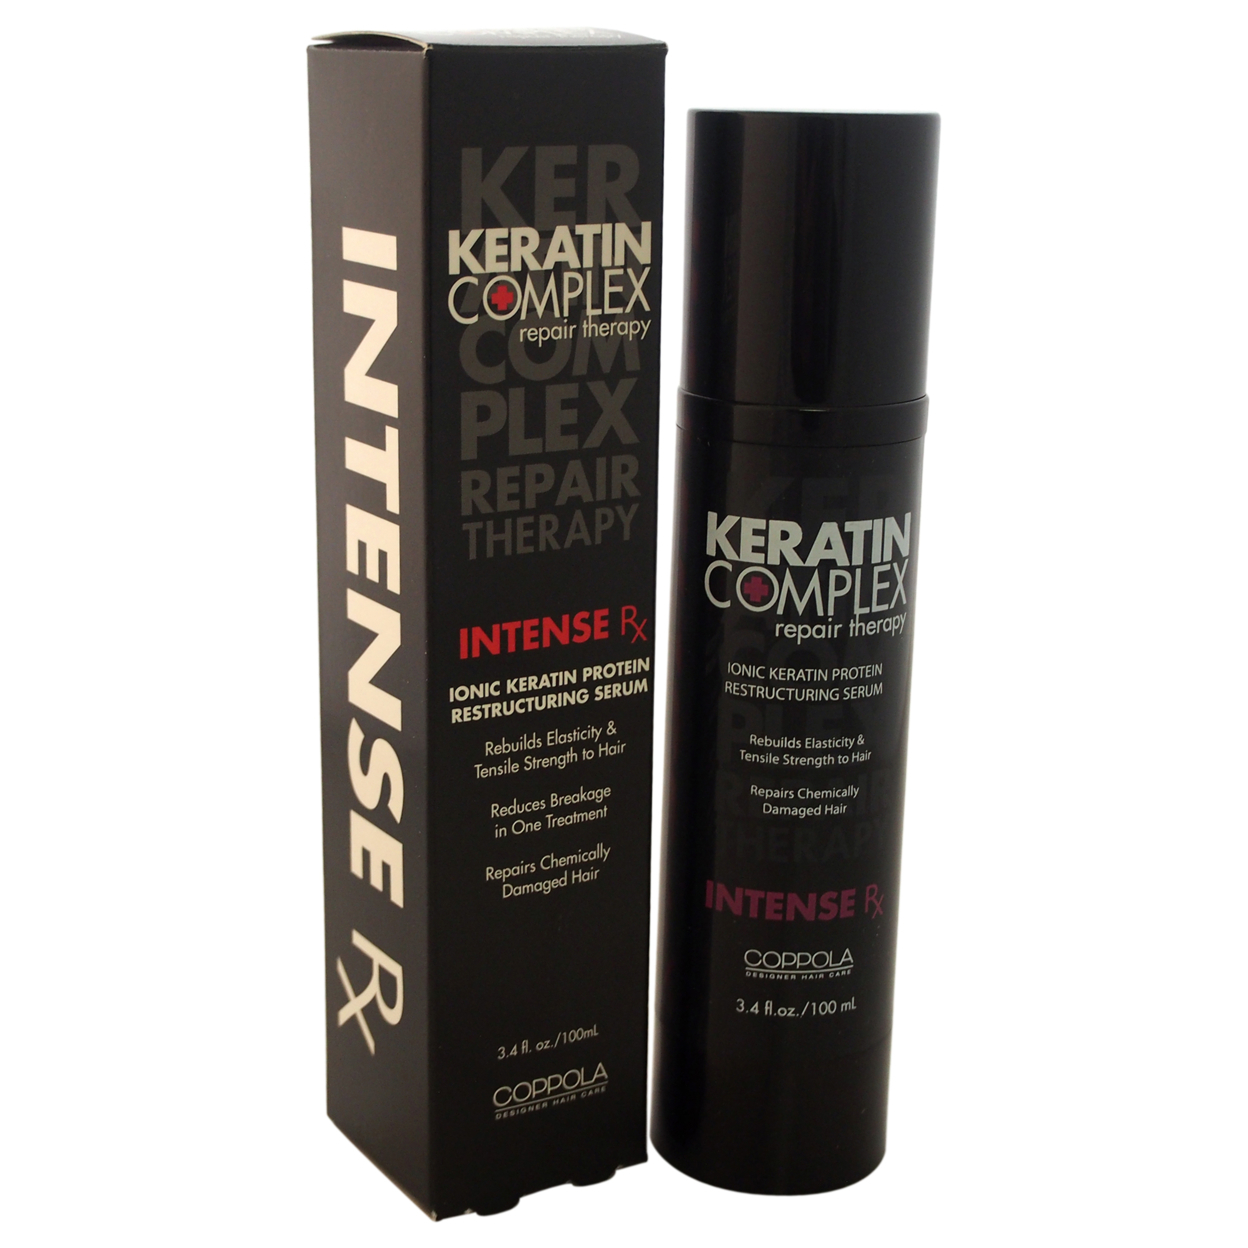 Keratin Complex Intense Rx Restructuring Serum by Keratin for Unisex - 3.4 oz Serum 56d0b90ba3771c59288b8e1e